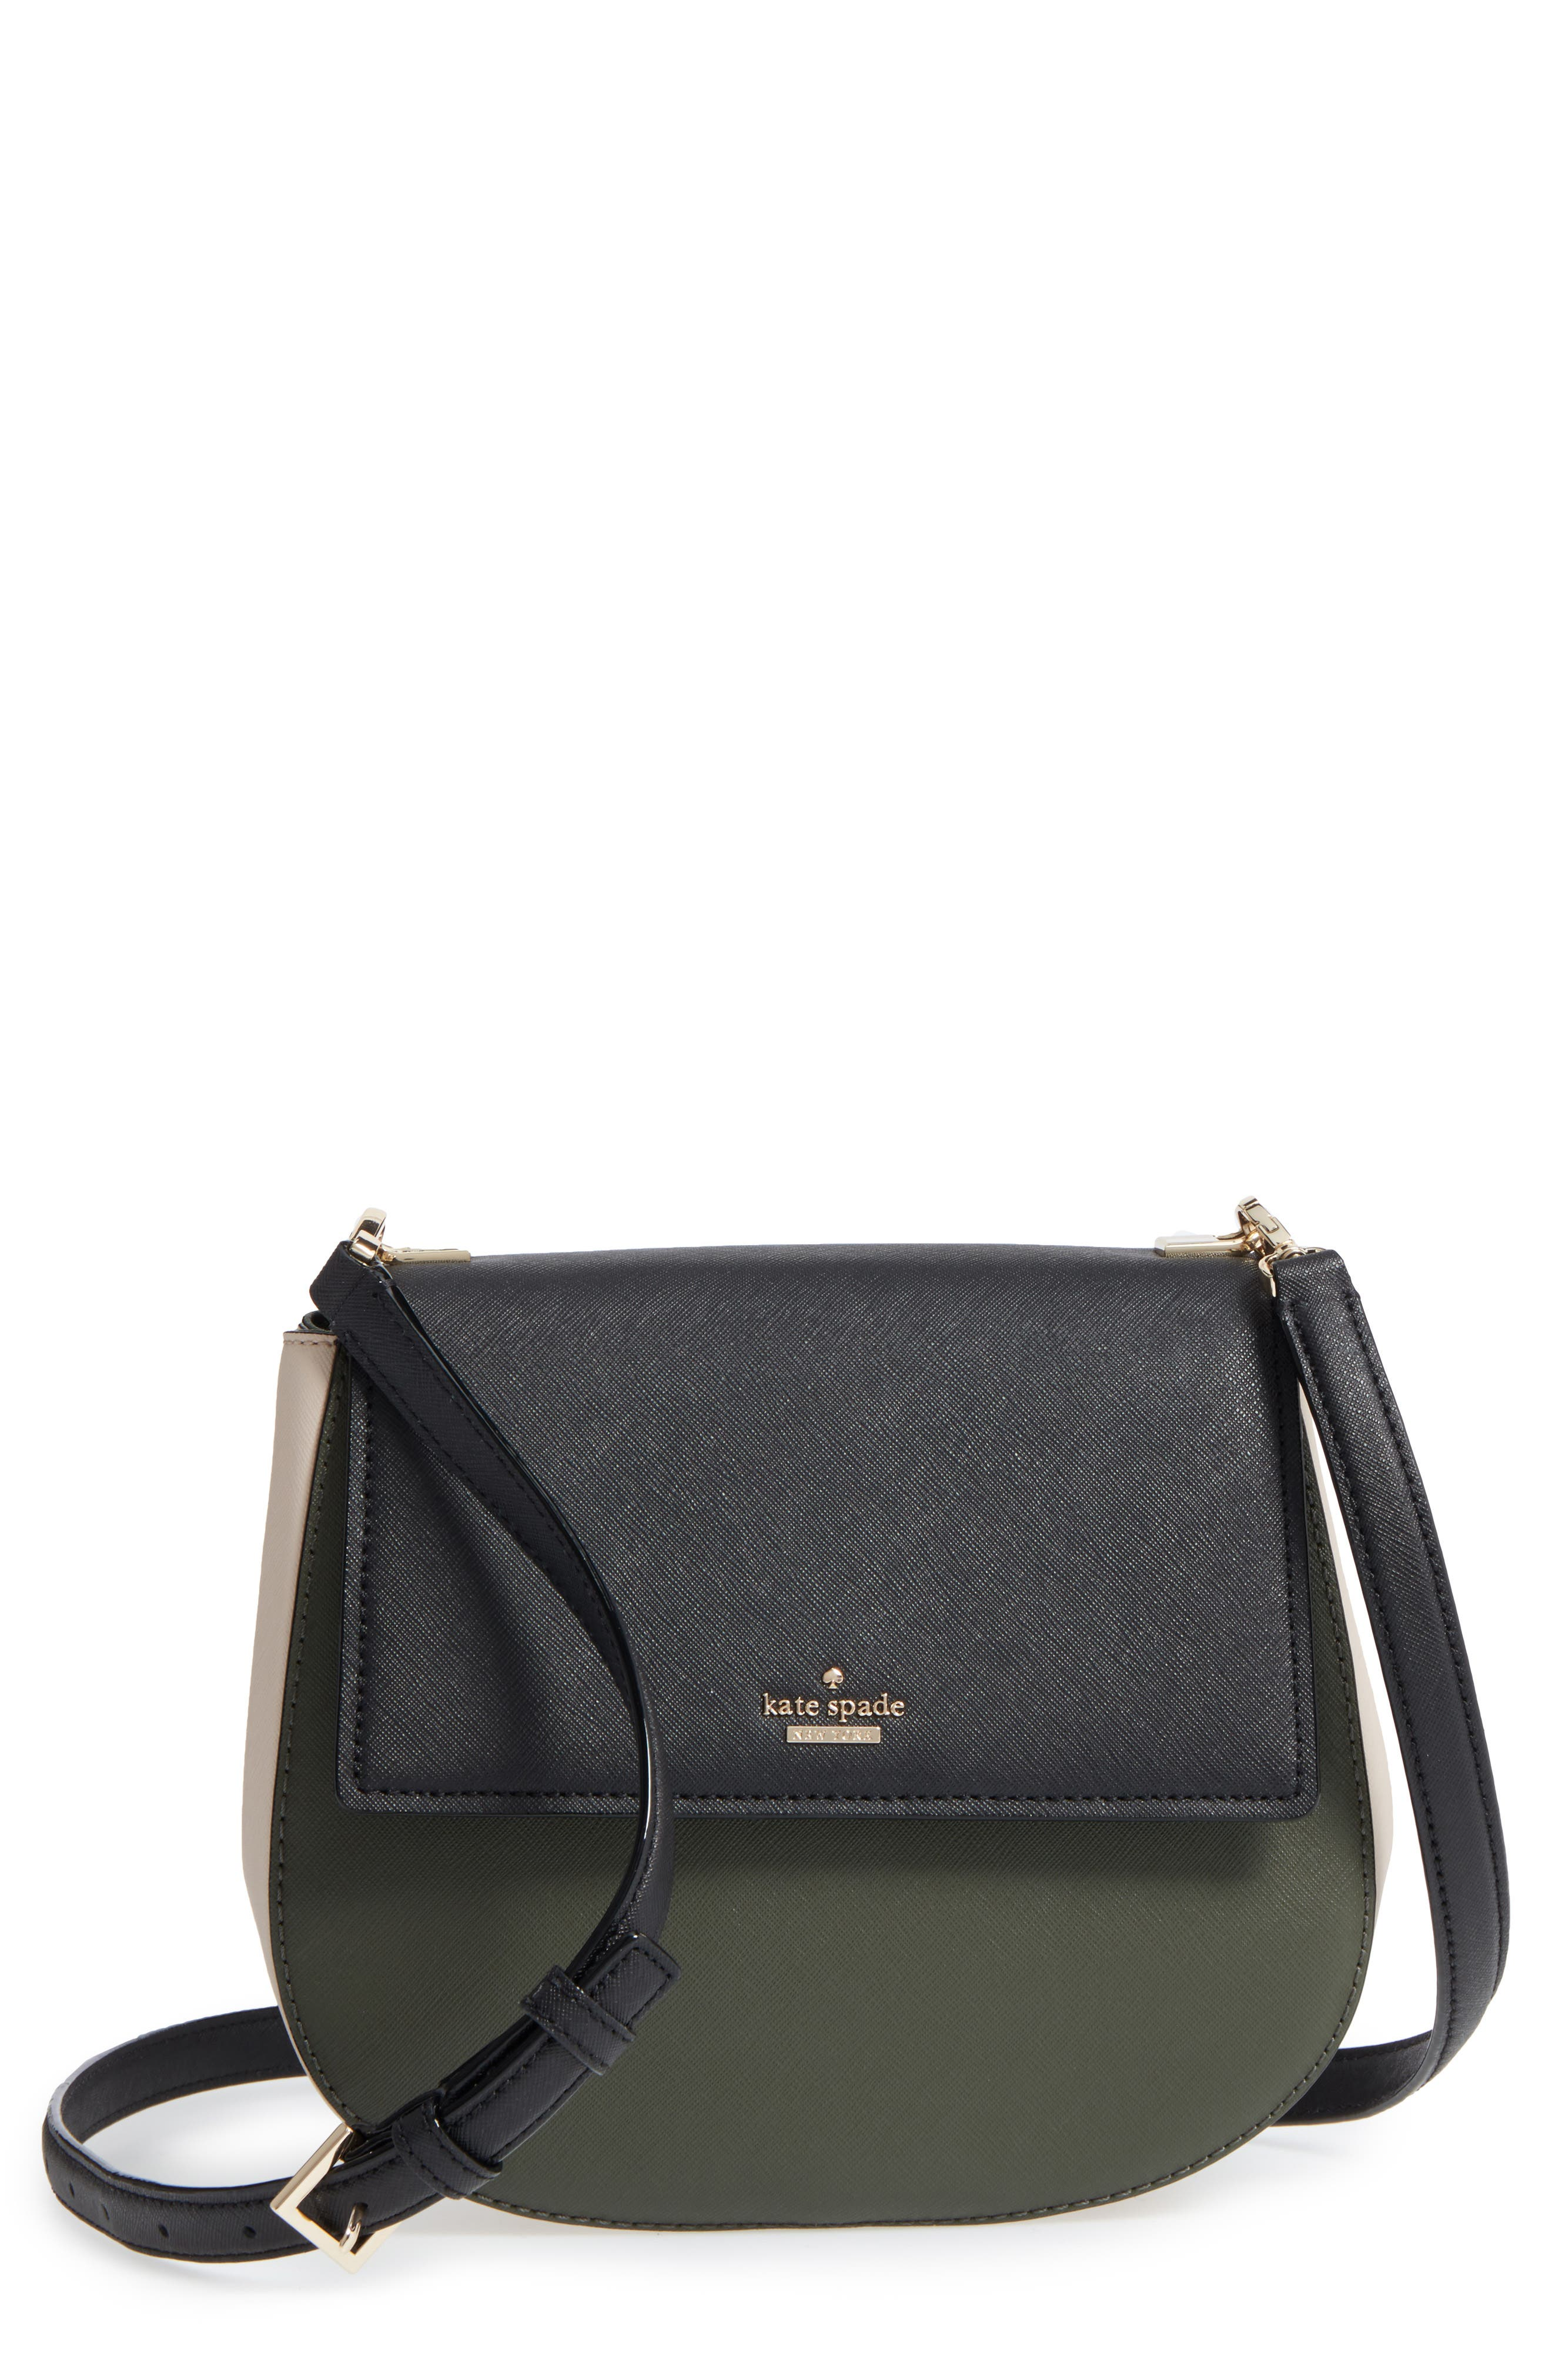 cameron street - byrdie leather crossbody bag,                             Main thumbnail 1, color,                             301